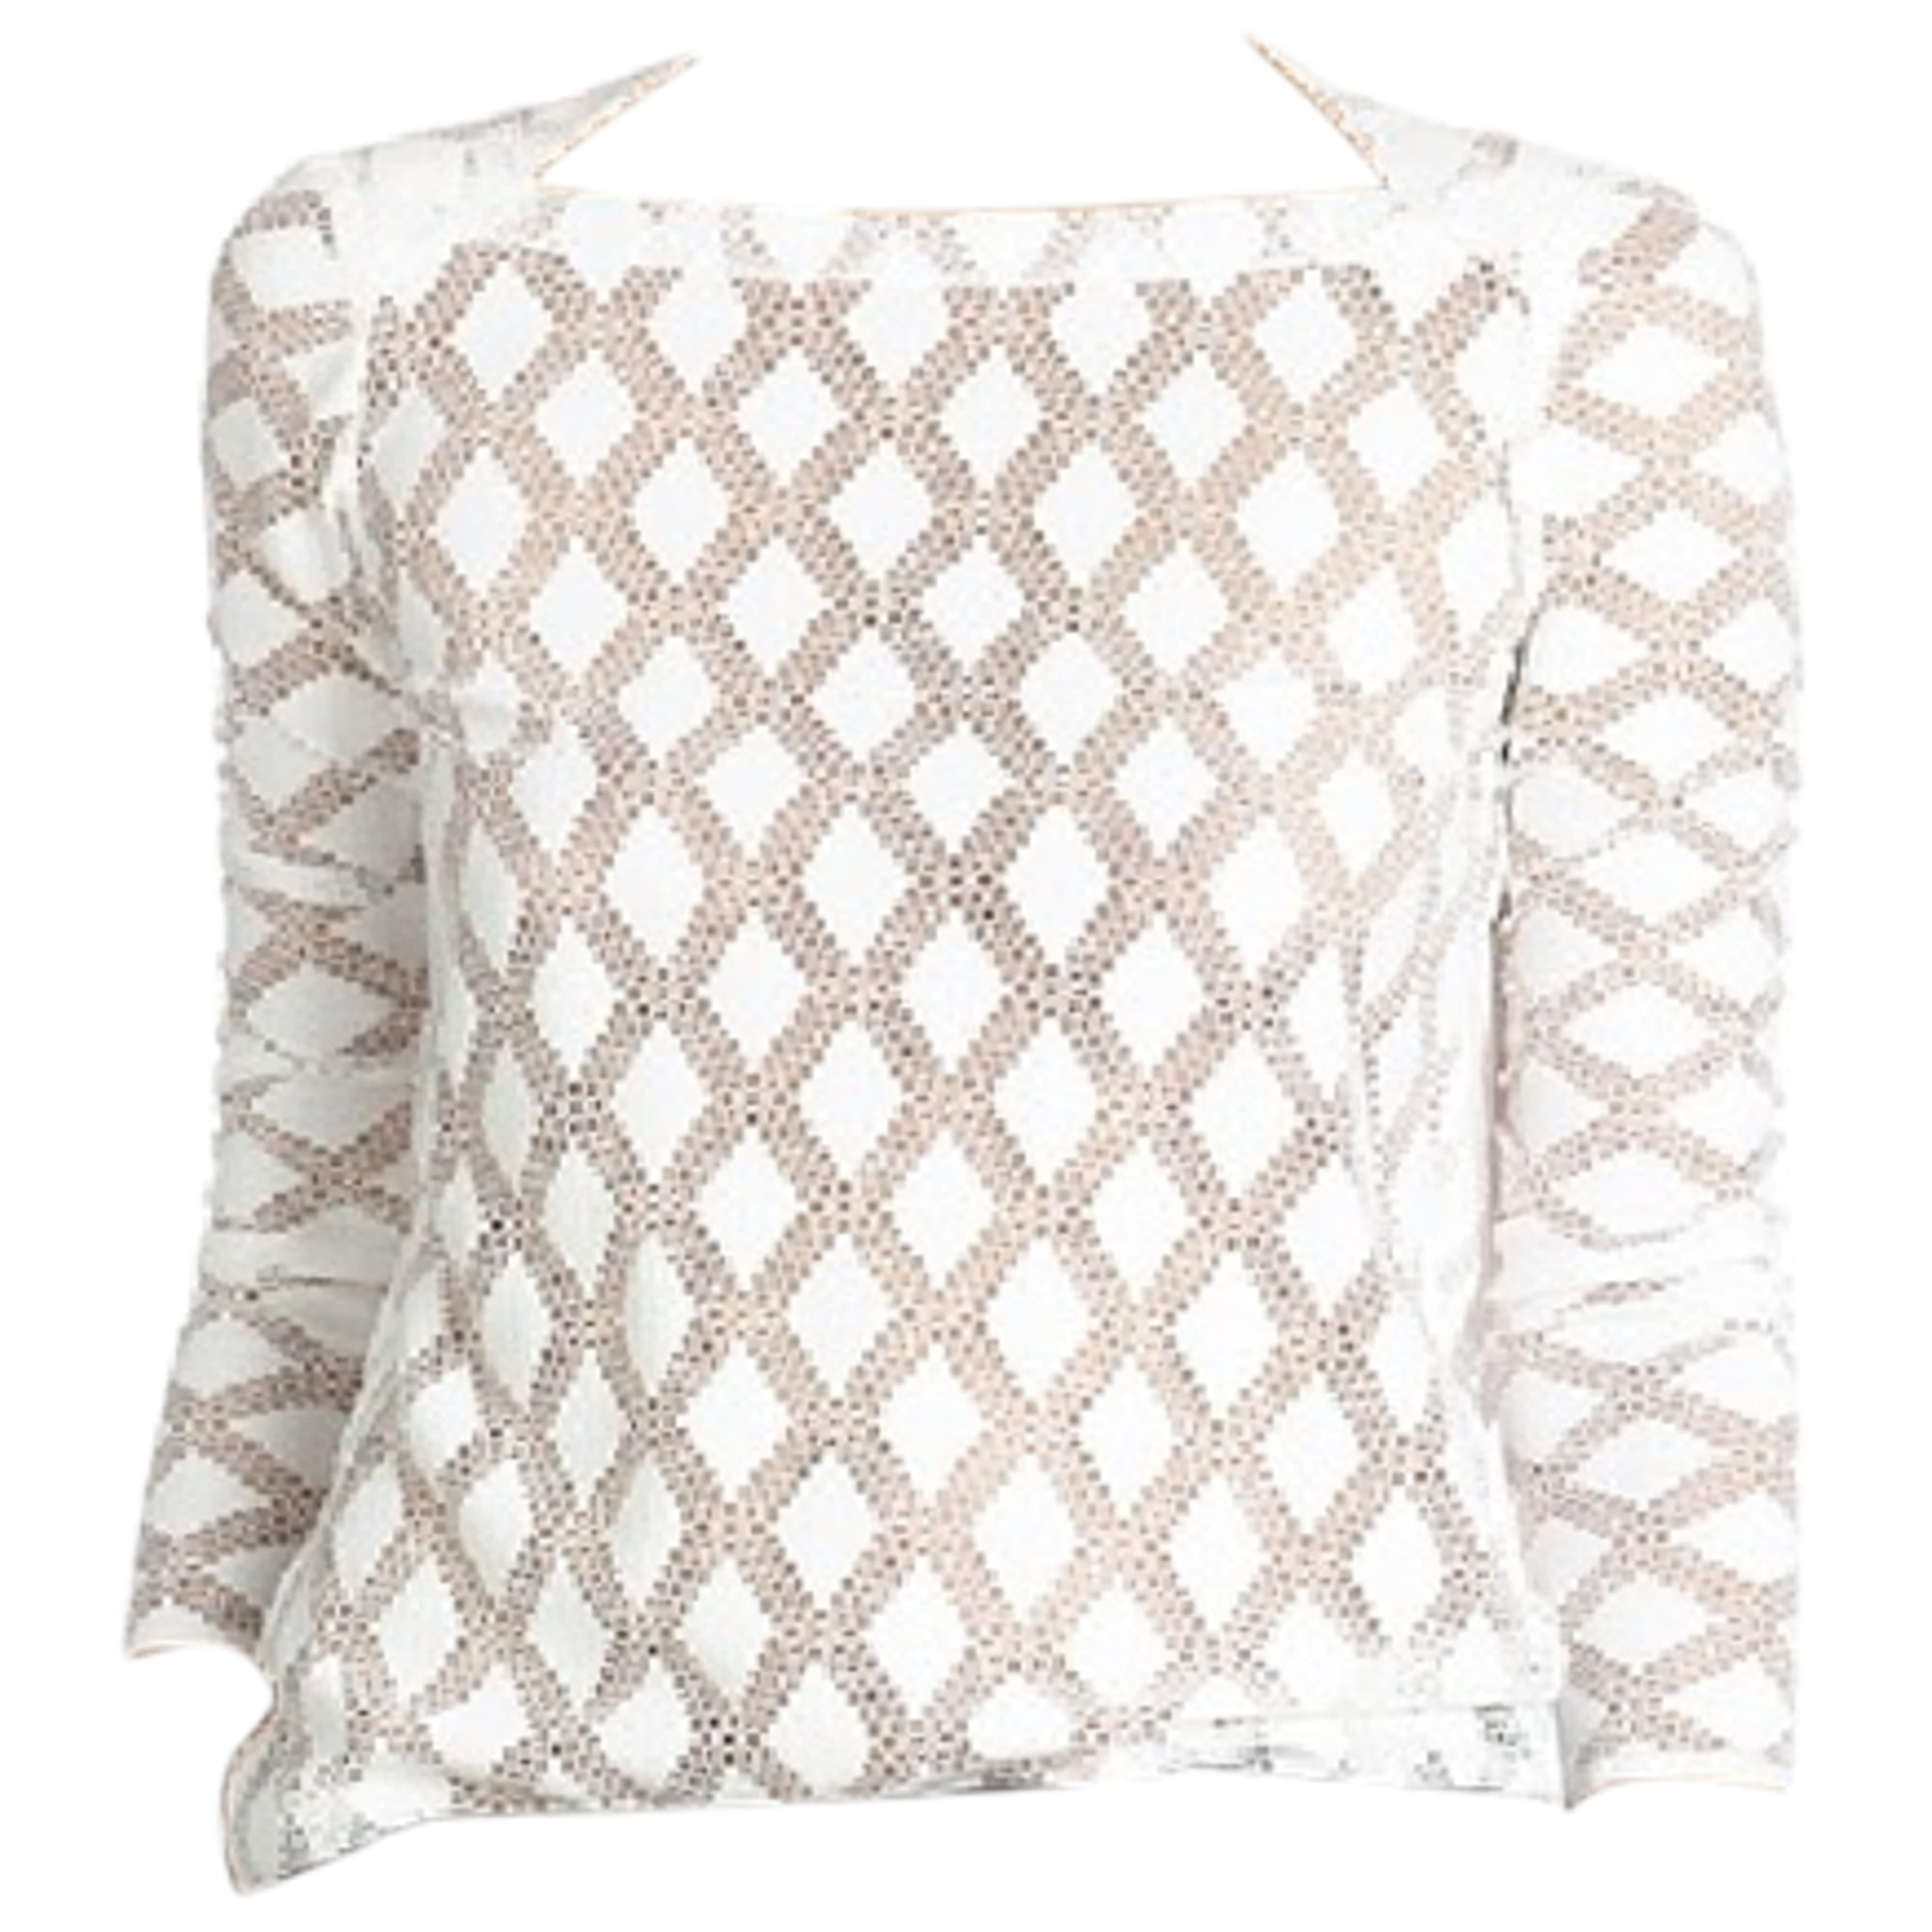 Maje Top, tee-shirt dentelle 38 (M, T2)